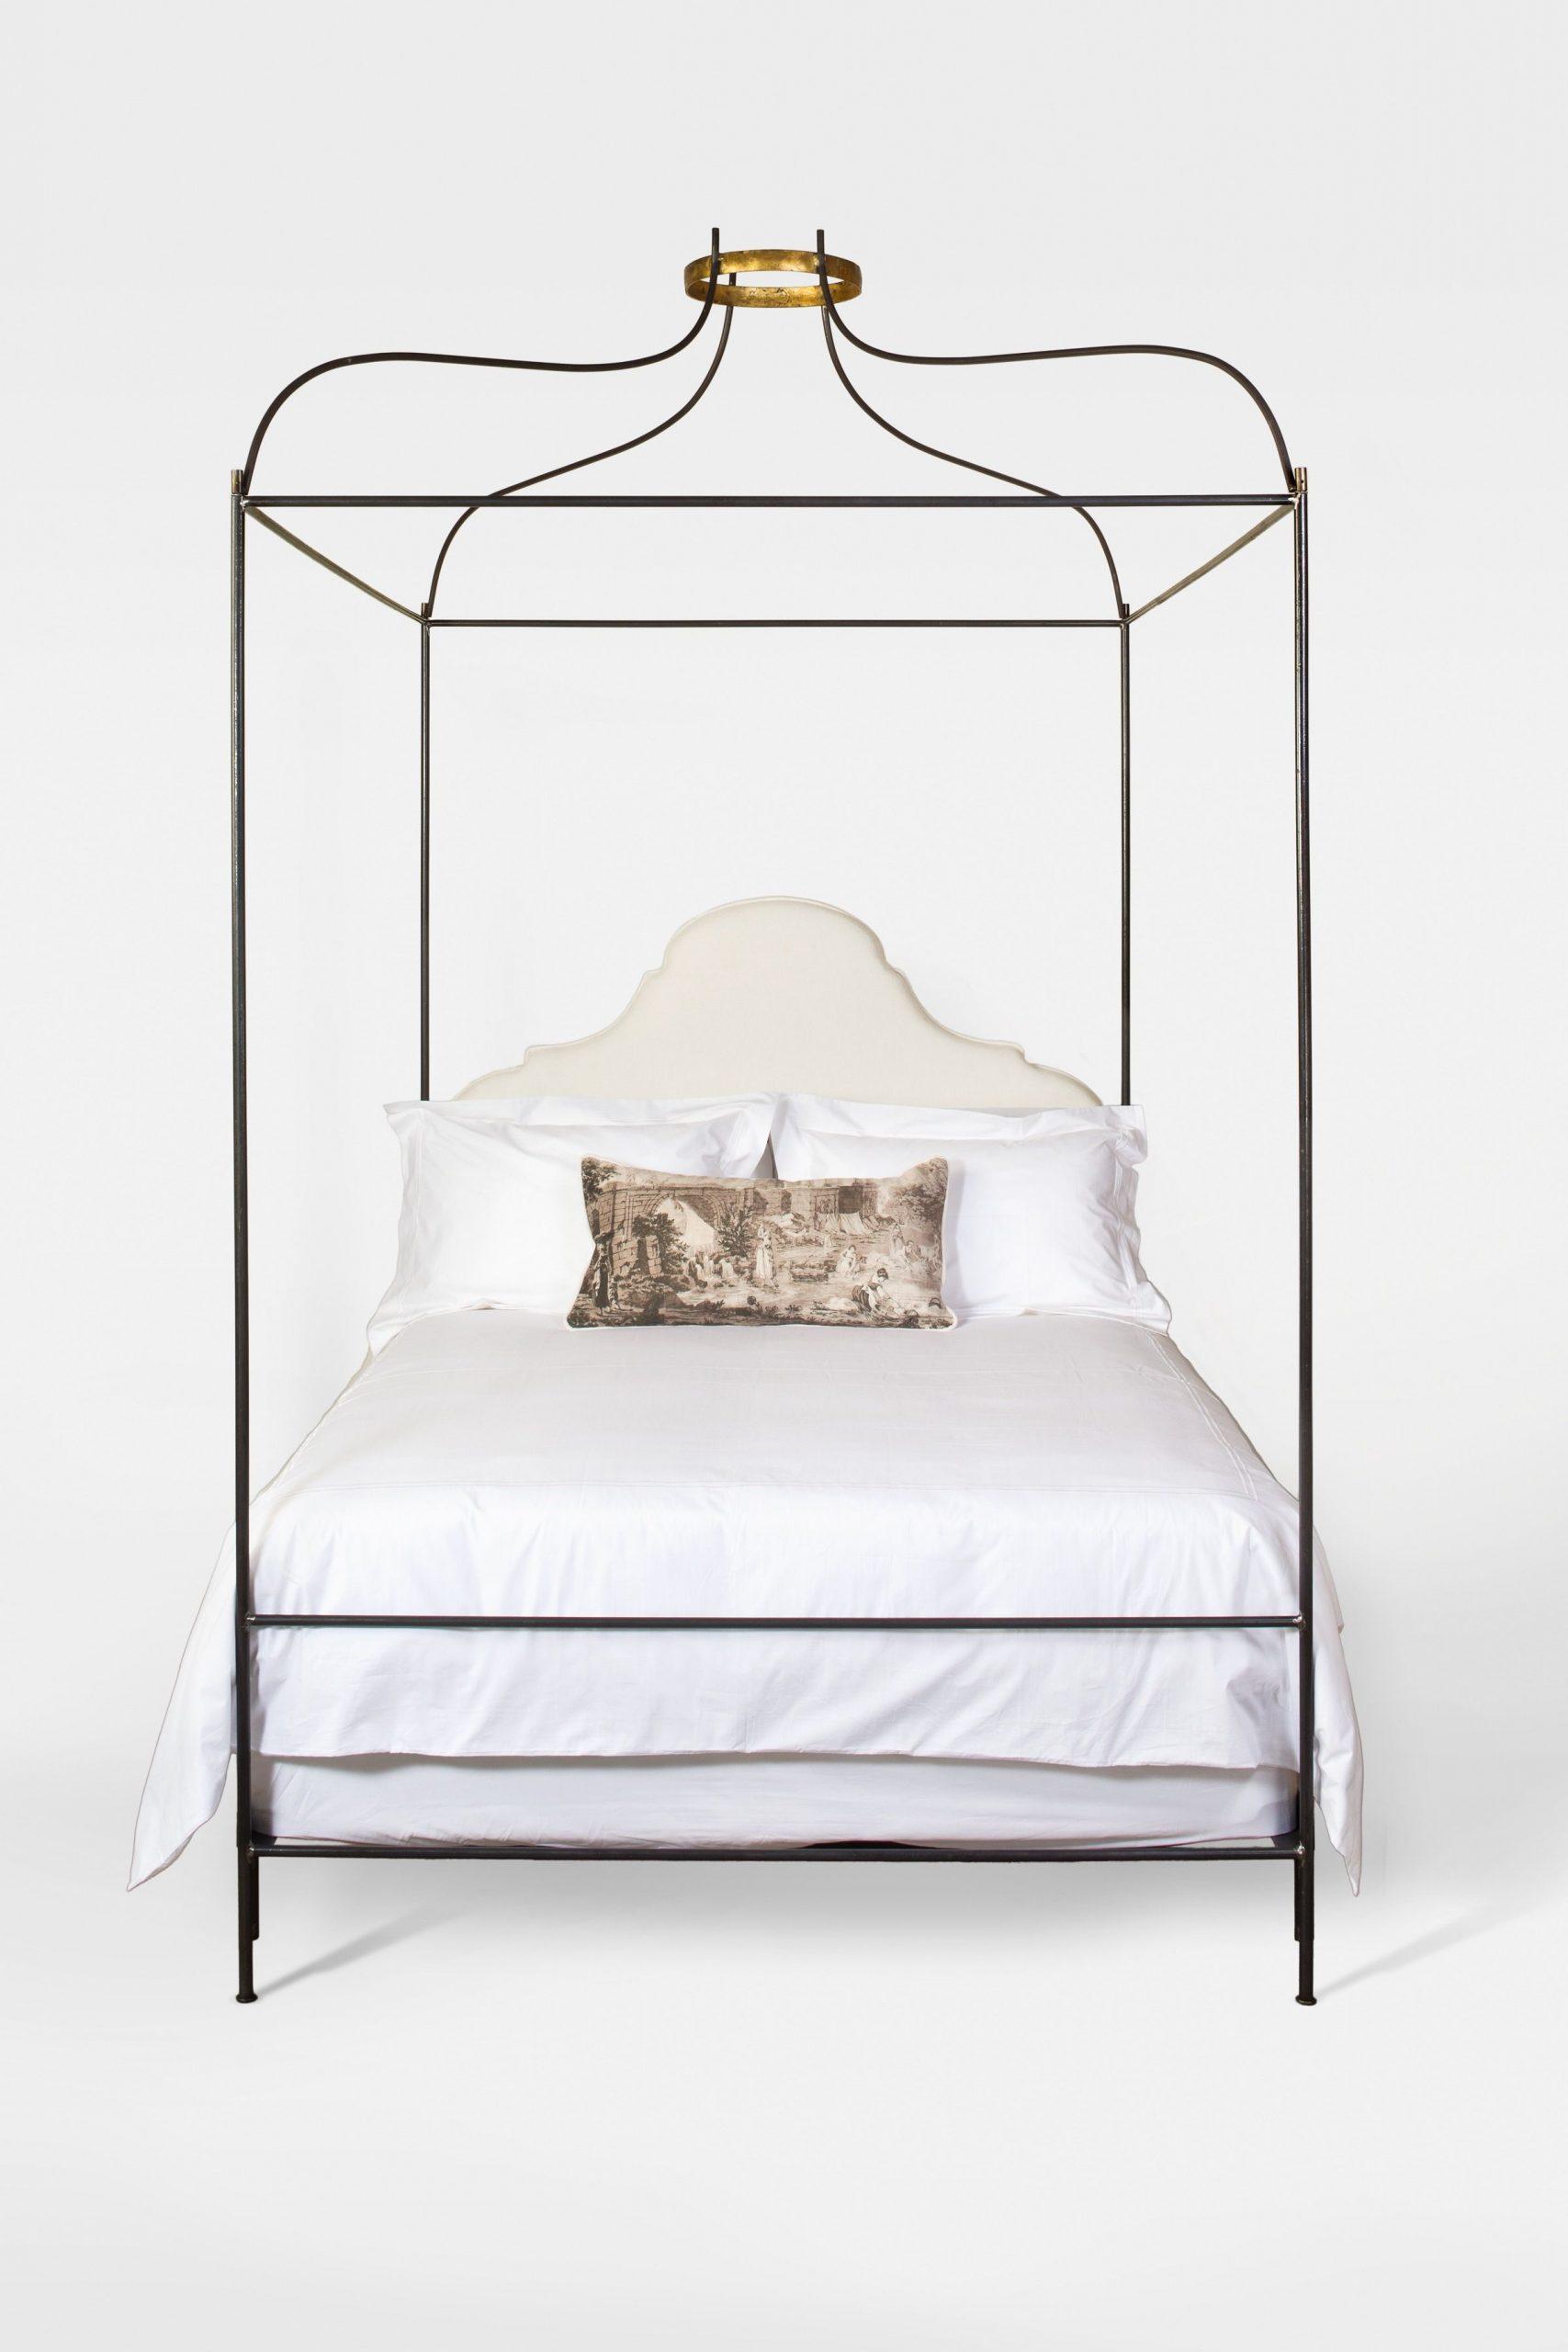 IRON VENETIAN CANOPY BED